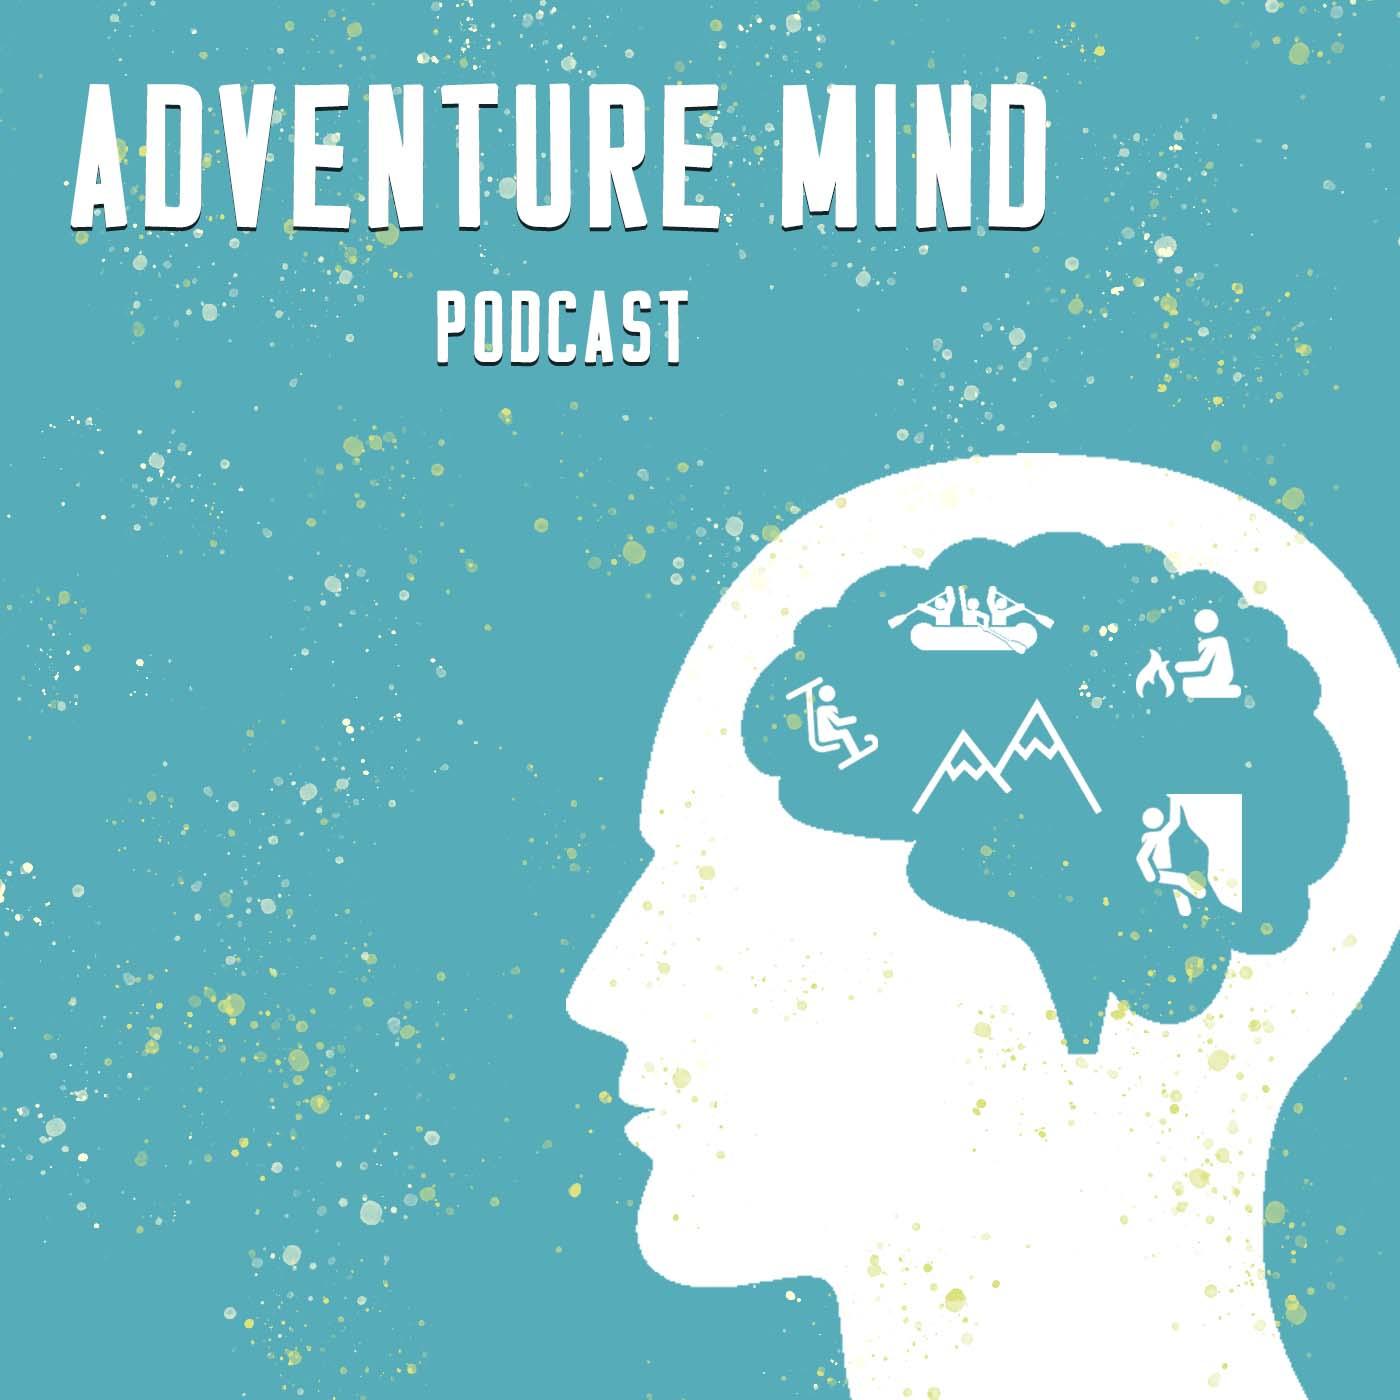 Adventure Mind Podcast show artwork.